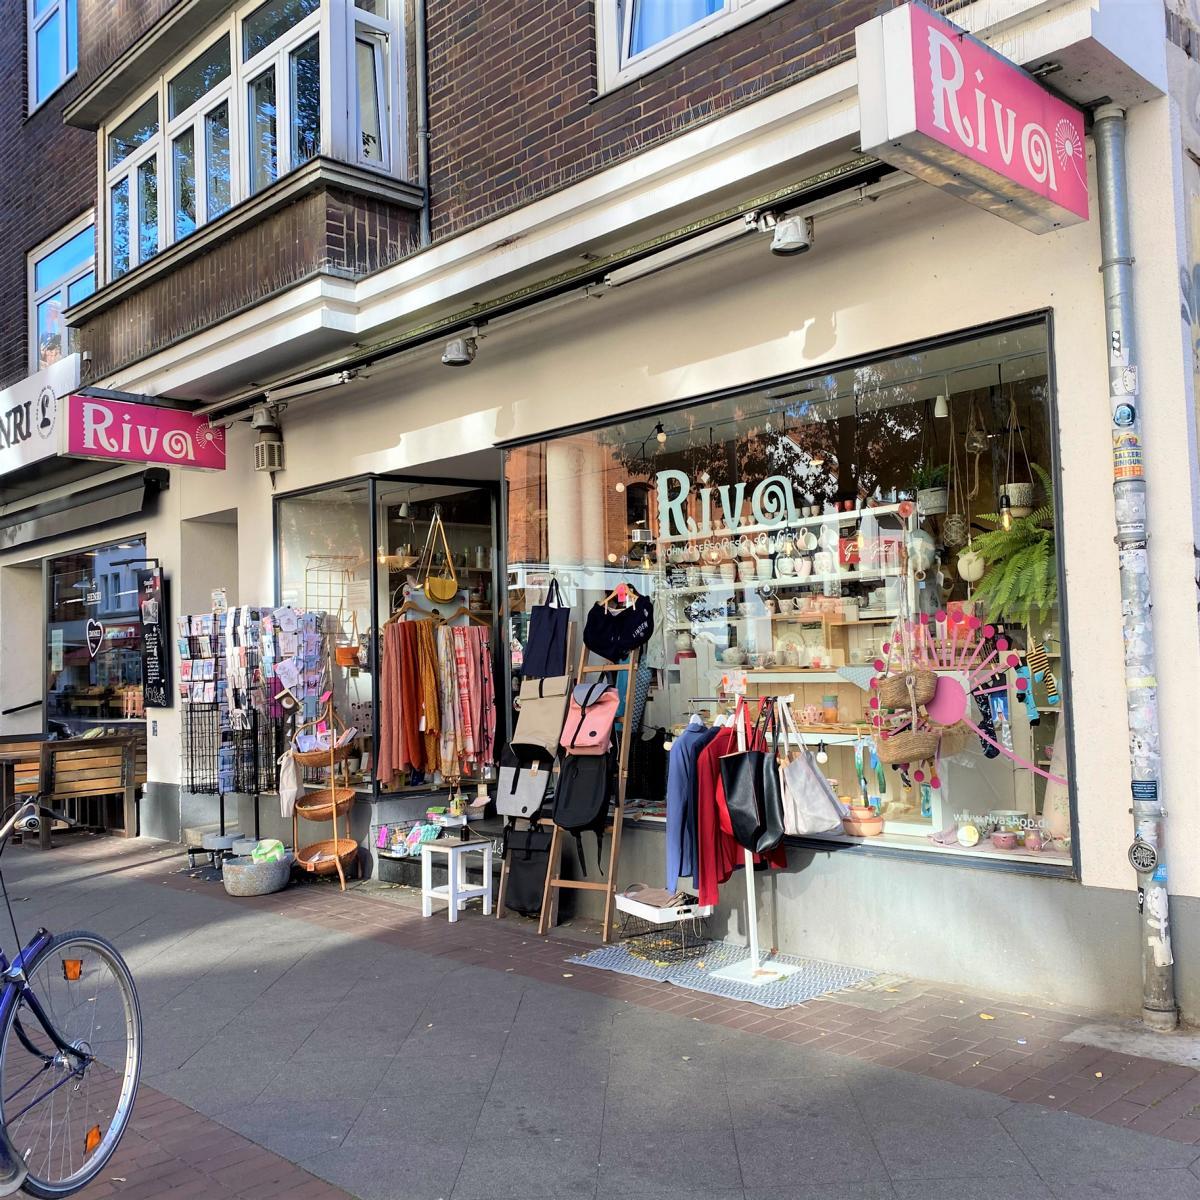 style hannover riva 1 - Riva - Wohnaccessoires und mehr